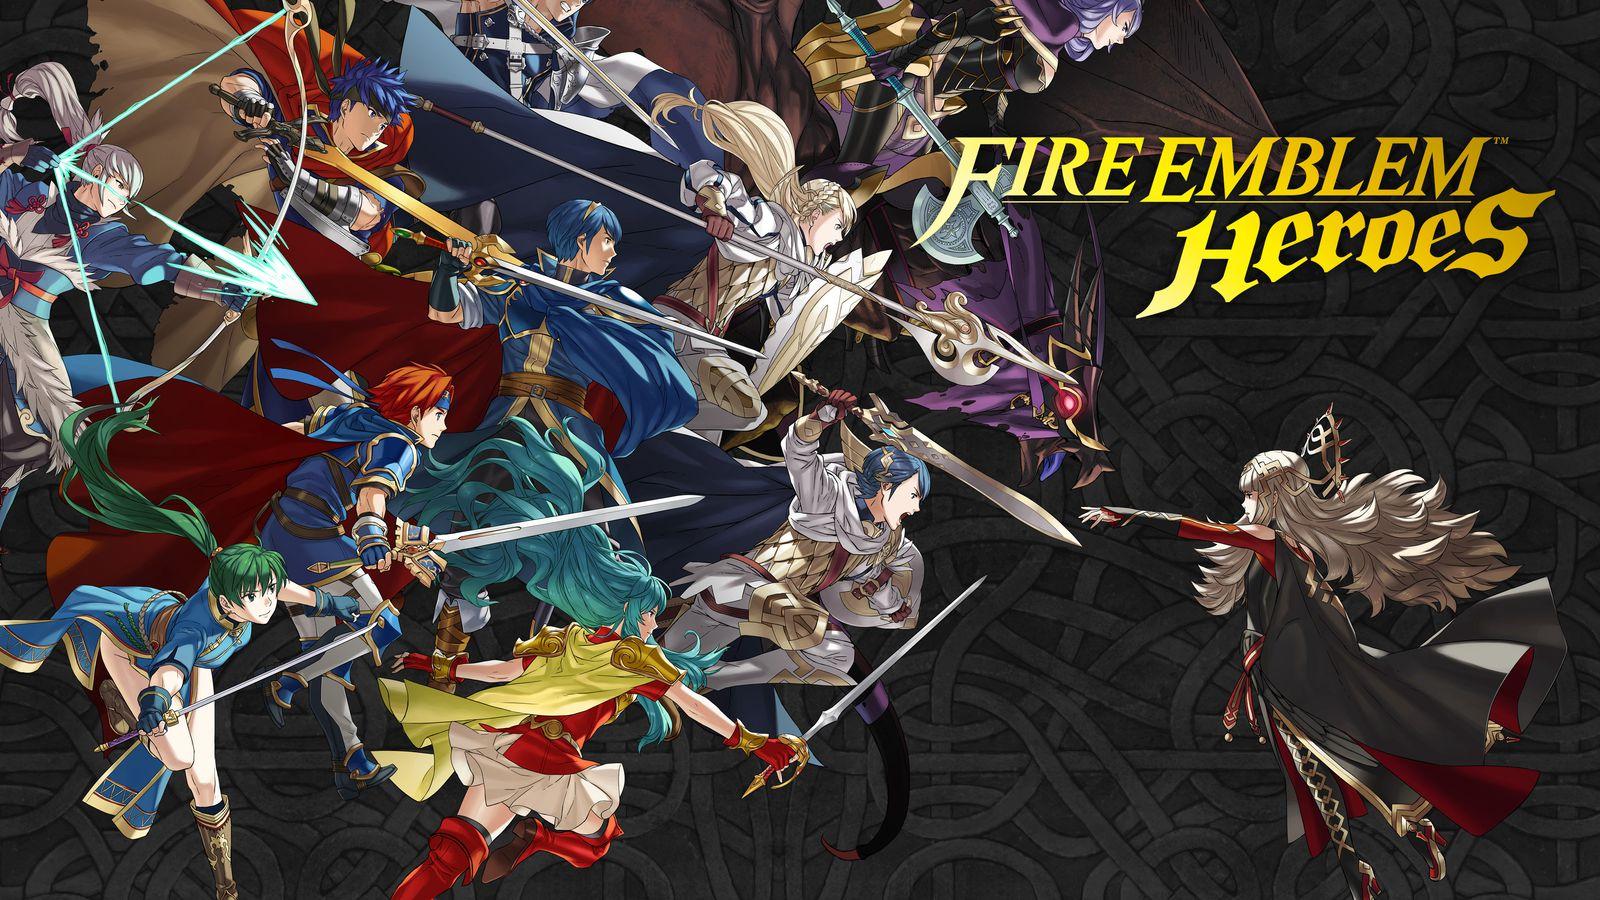 Ephraim llega a Fire Emblem Heroes